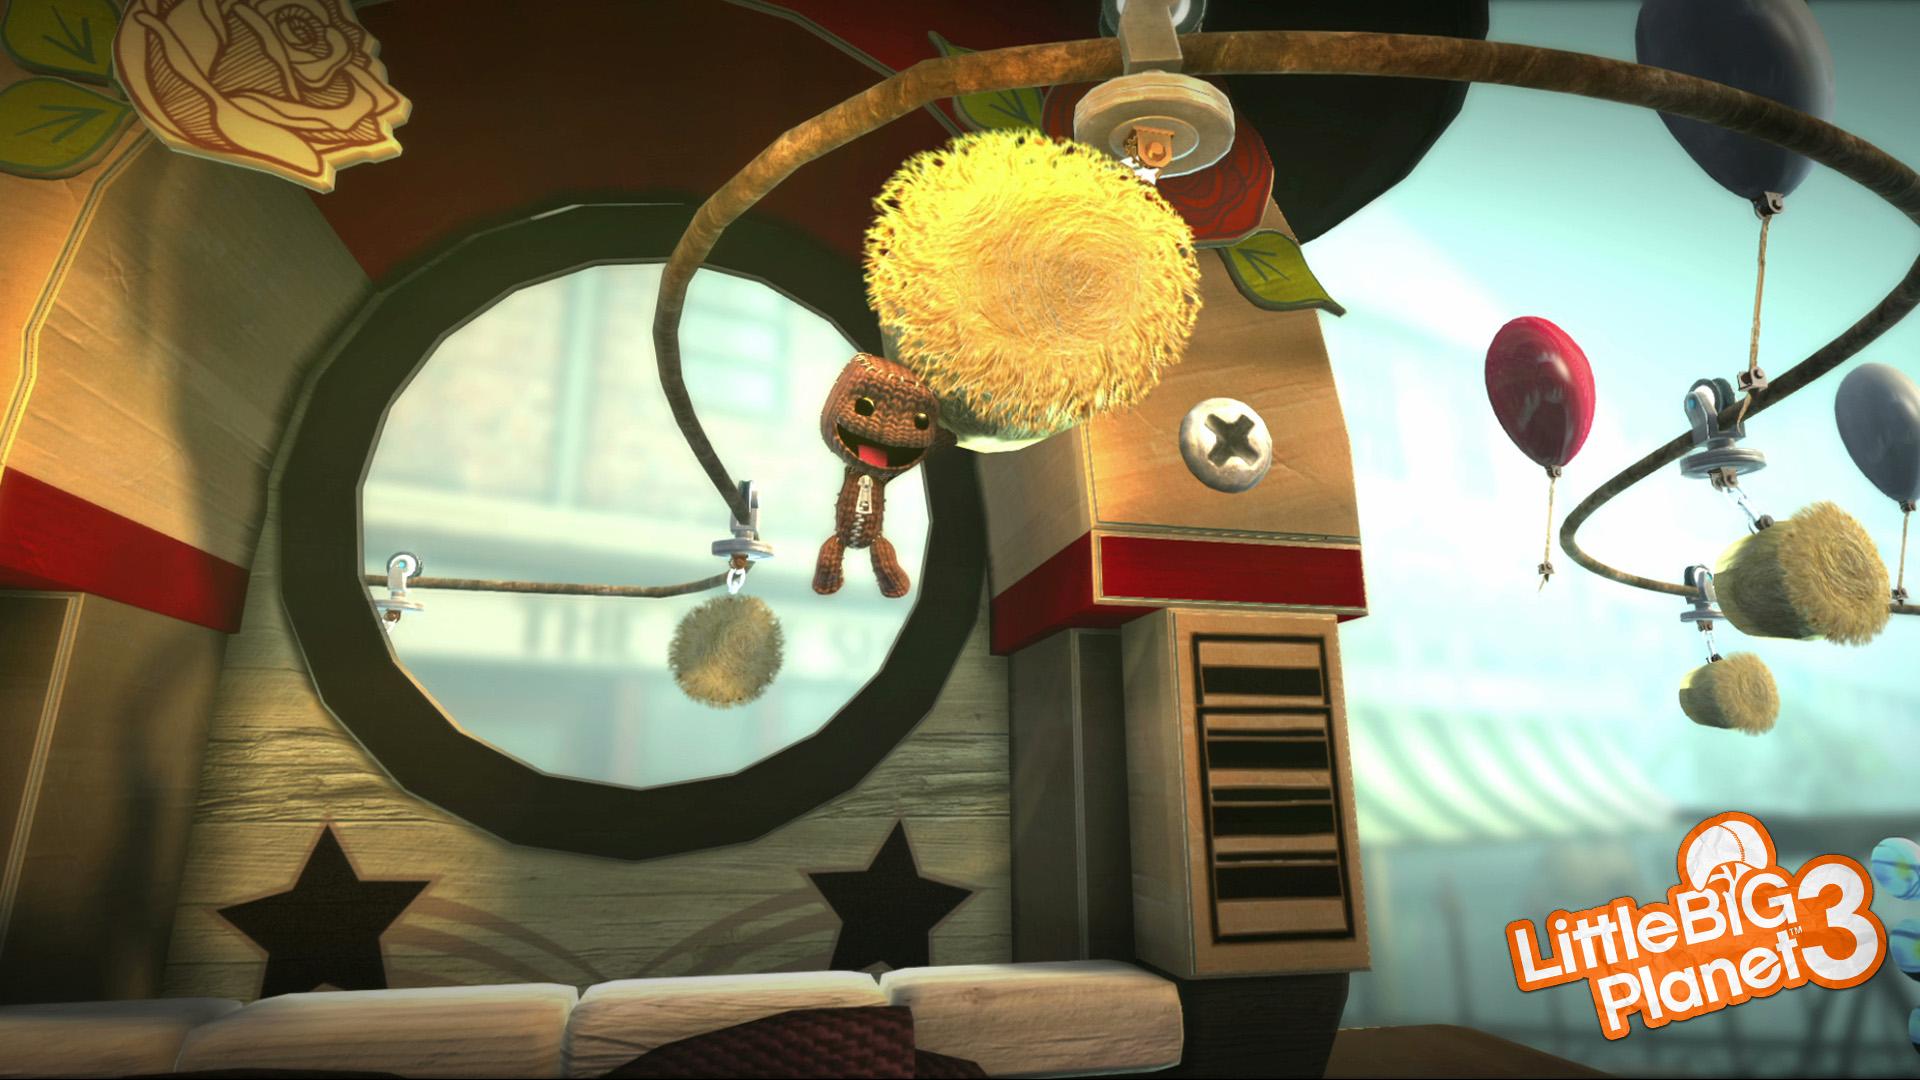 LittleBigPlanet3 PS4 Editeur 019